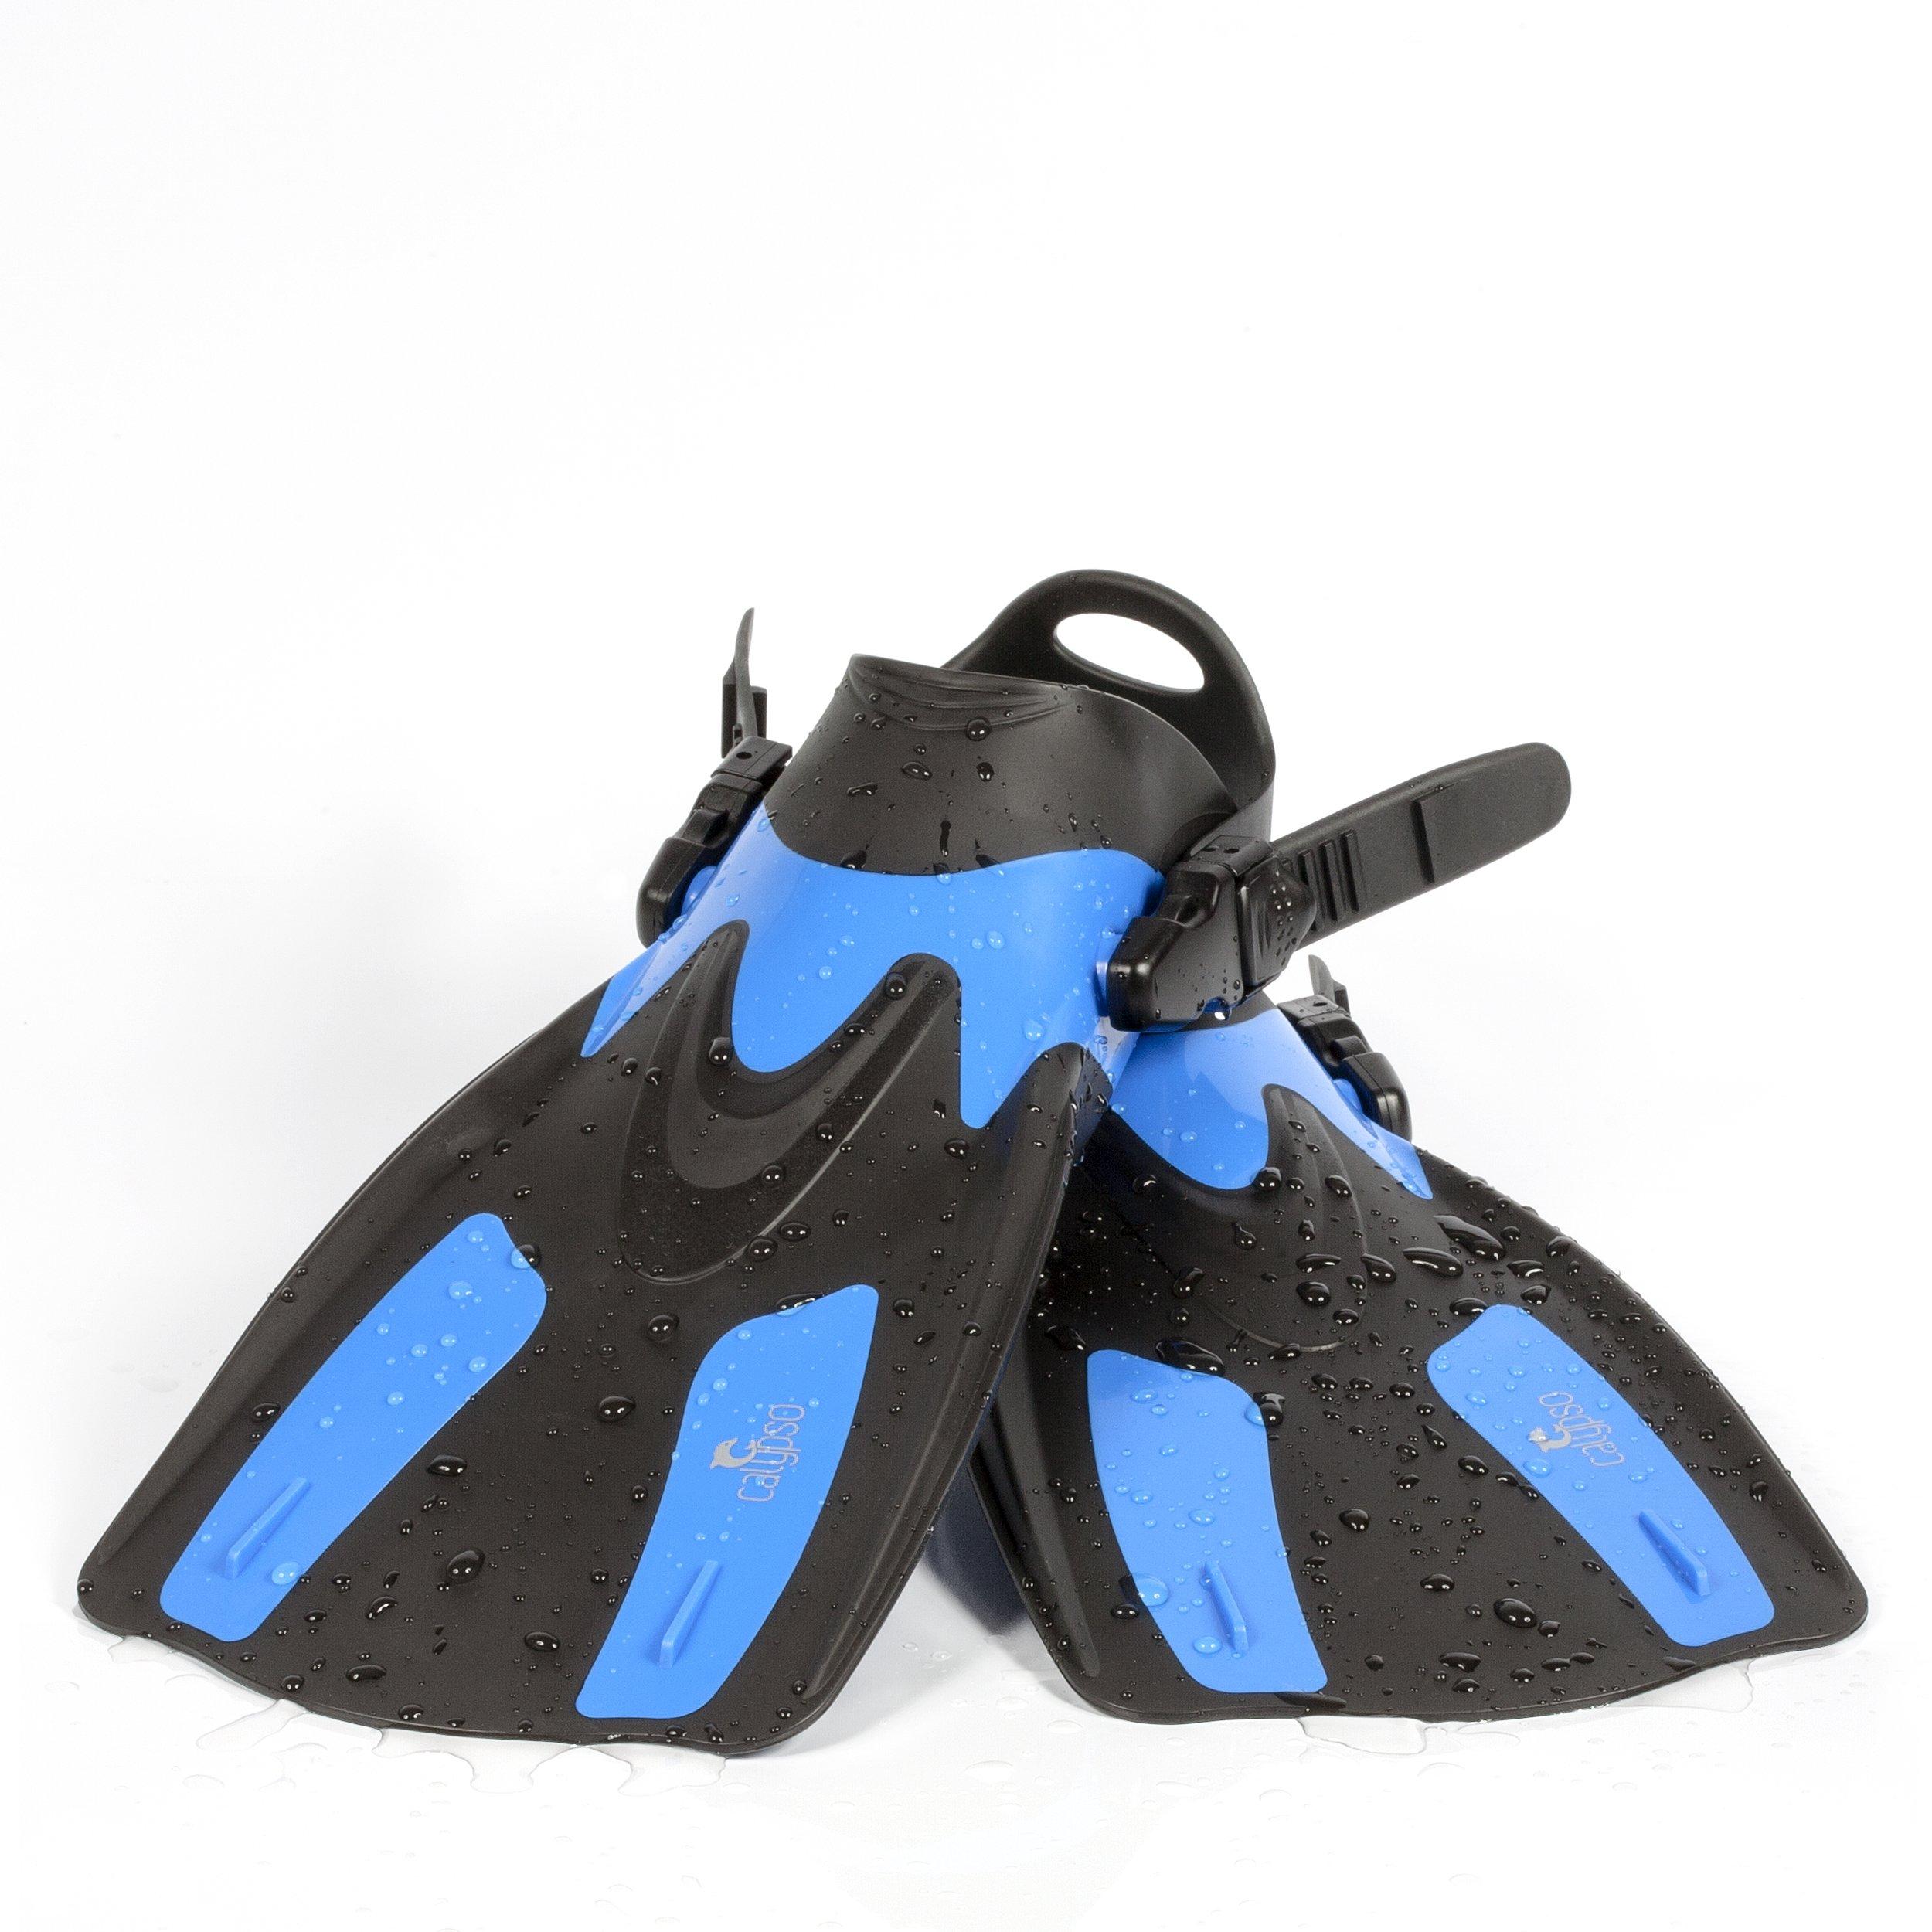 Calypso Swimming Fin - Open Heel Adjustable Snorkel Fin - (XS-M) by Calypso Aquatics